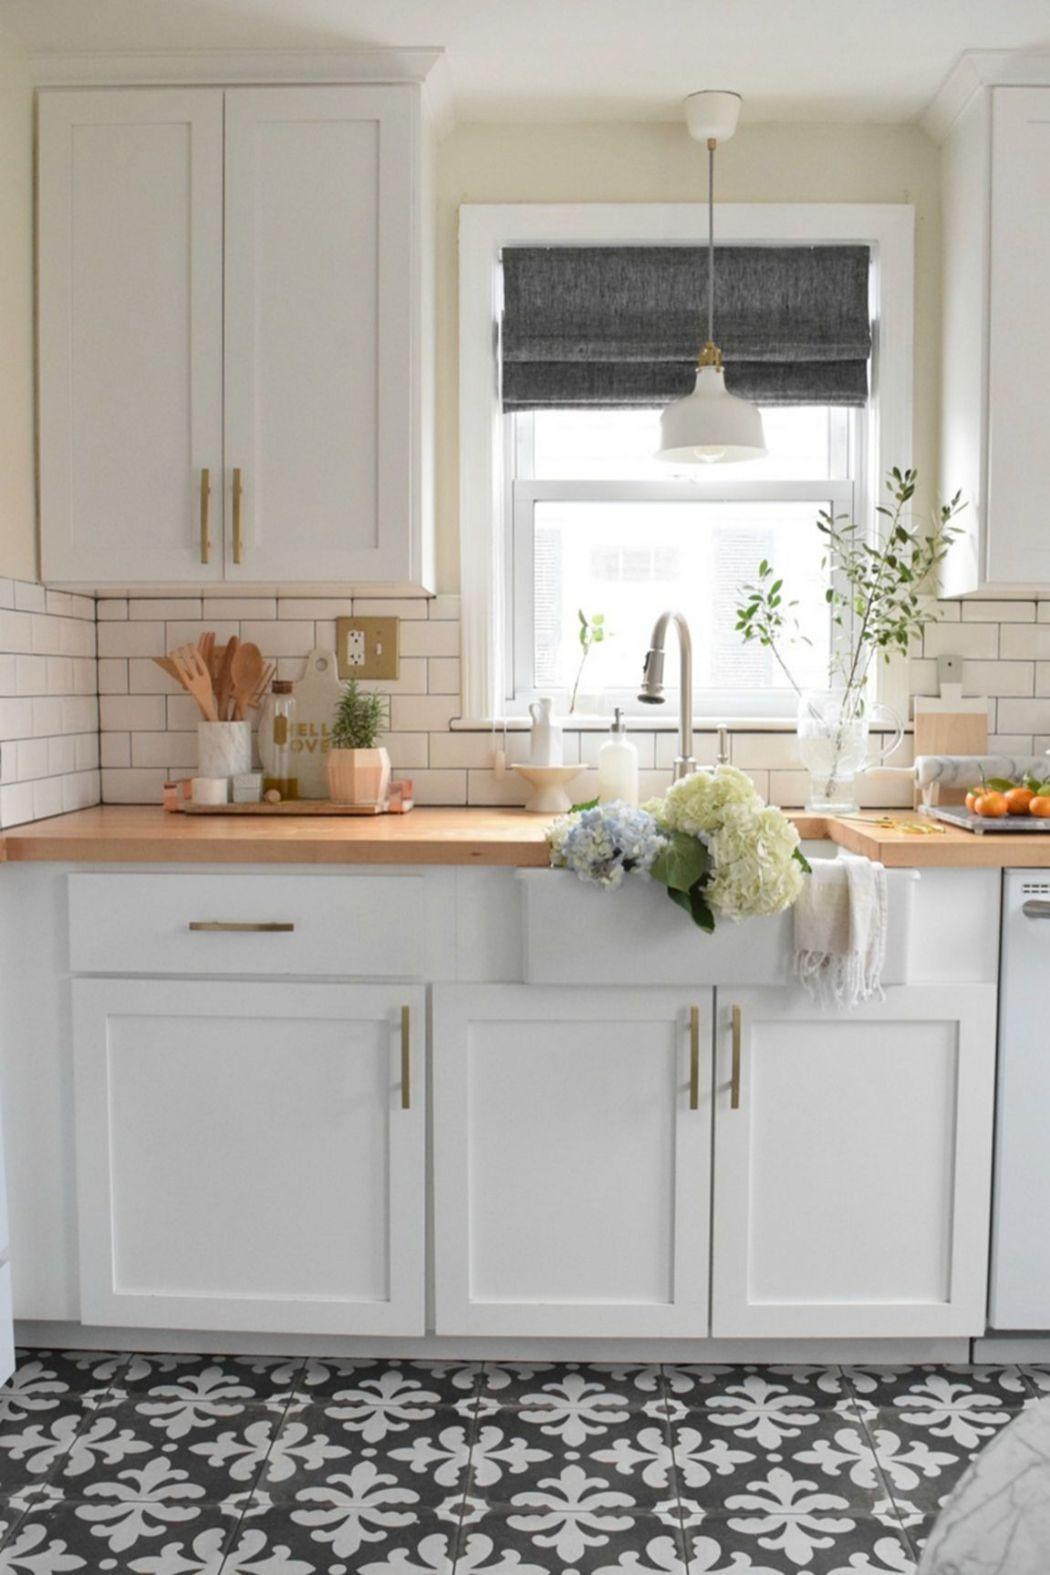 Elegant Black And White Floor Tile Color Ideas 1200 Kitchen Remodel Small Kitchen Flooring Kitchen Floor Tile